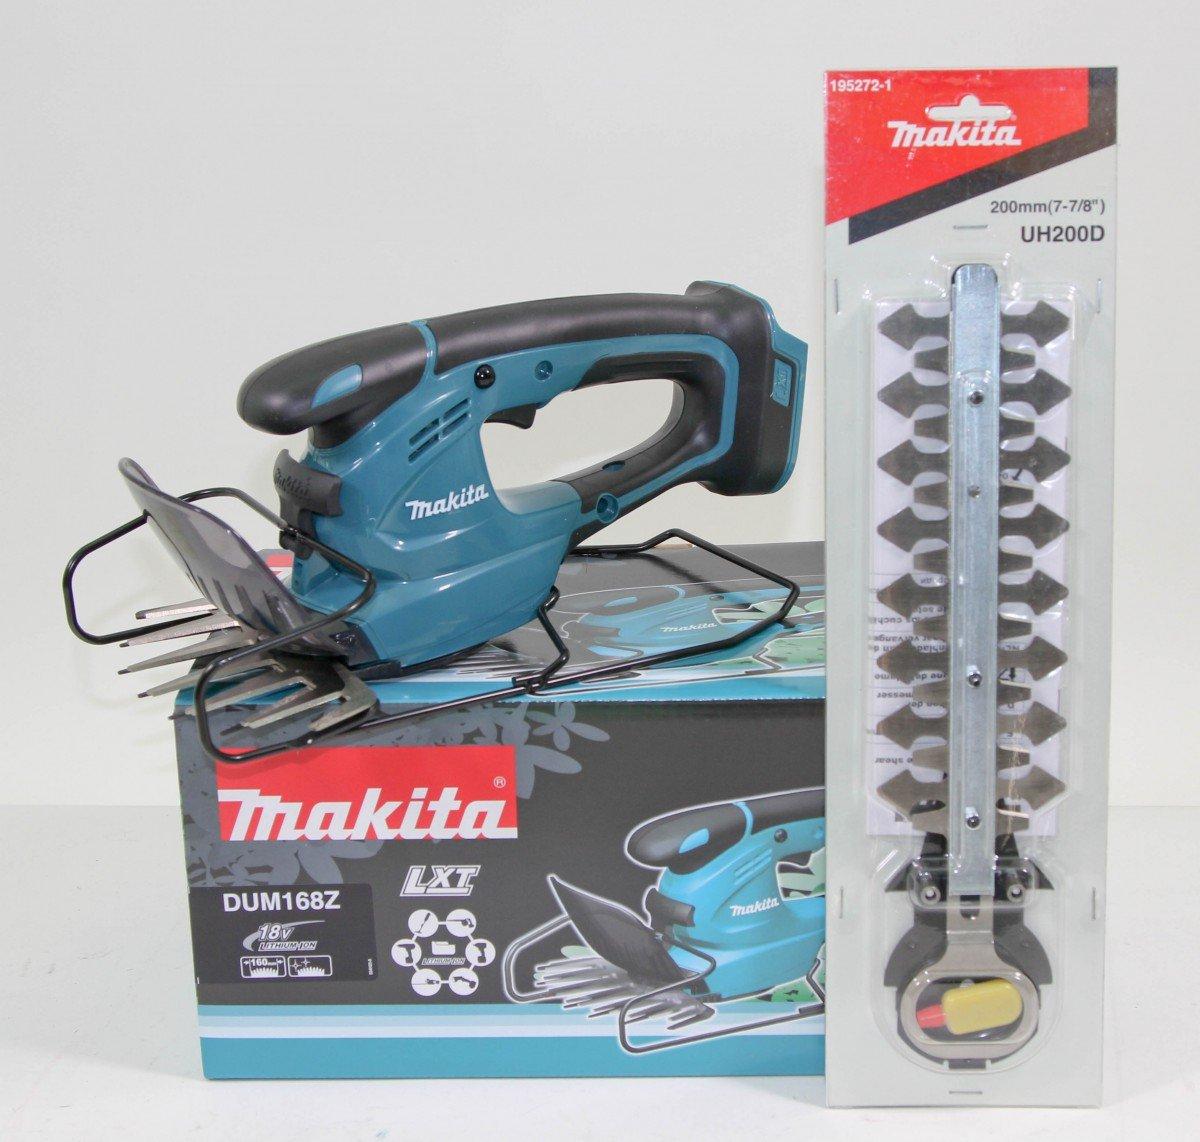 Makita DUM168Z 18V Akku-Grasschere inkl. UH200D Strauchscheren-Aufsatz